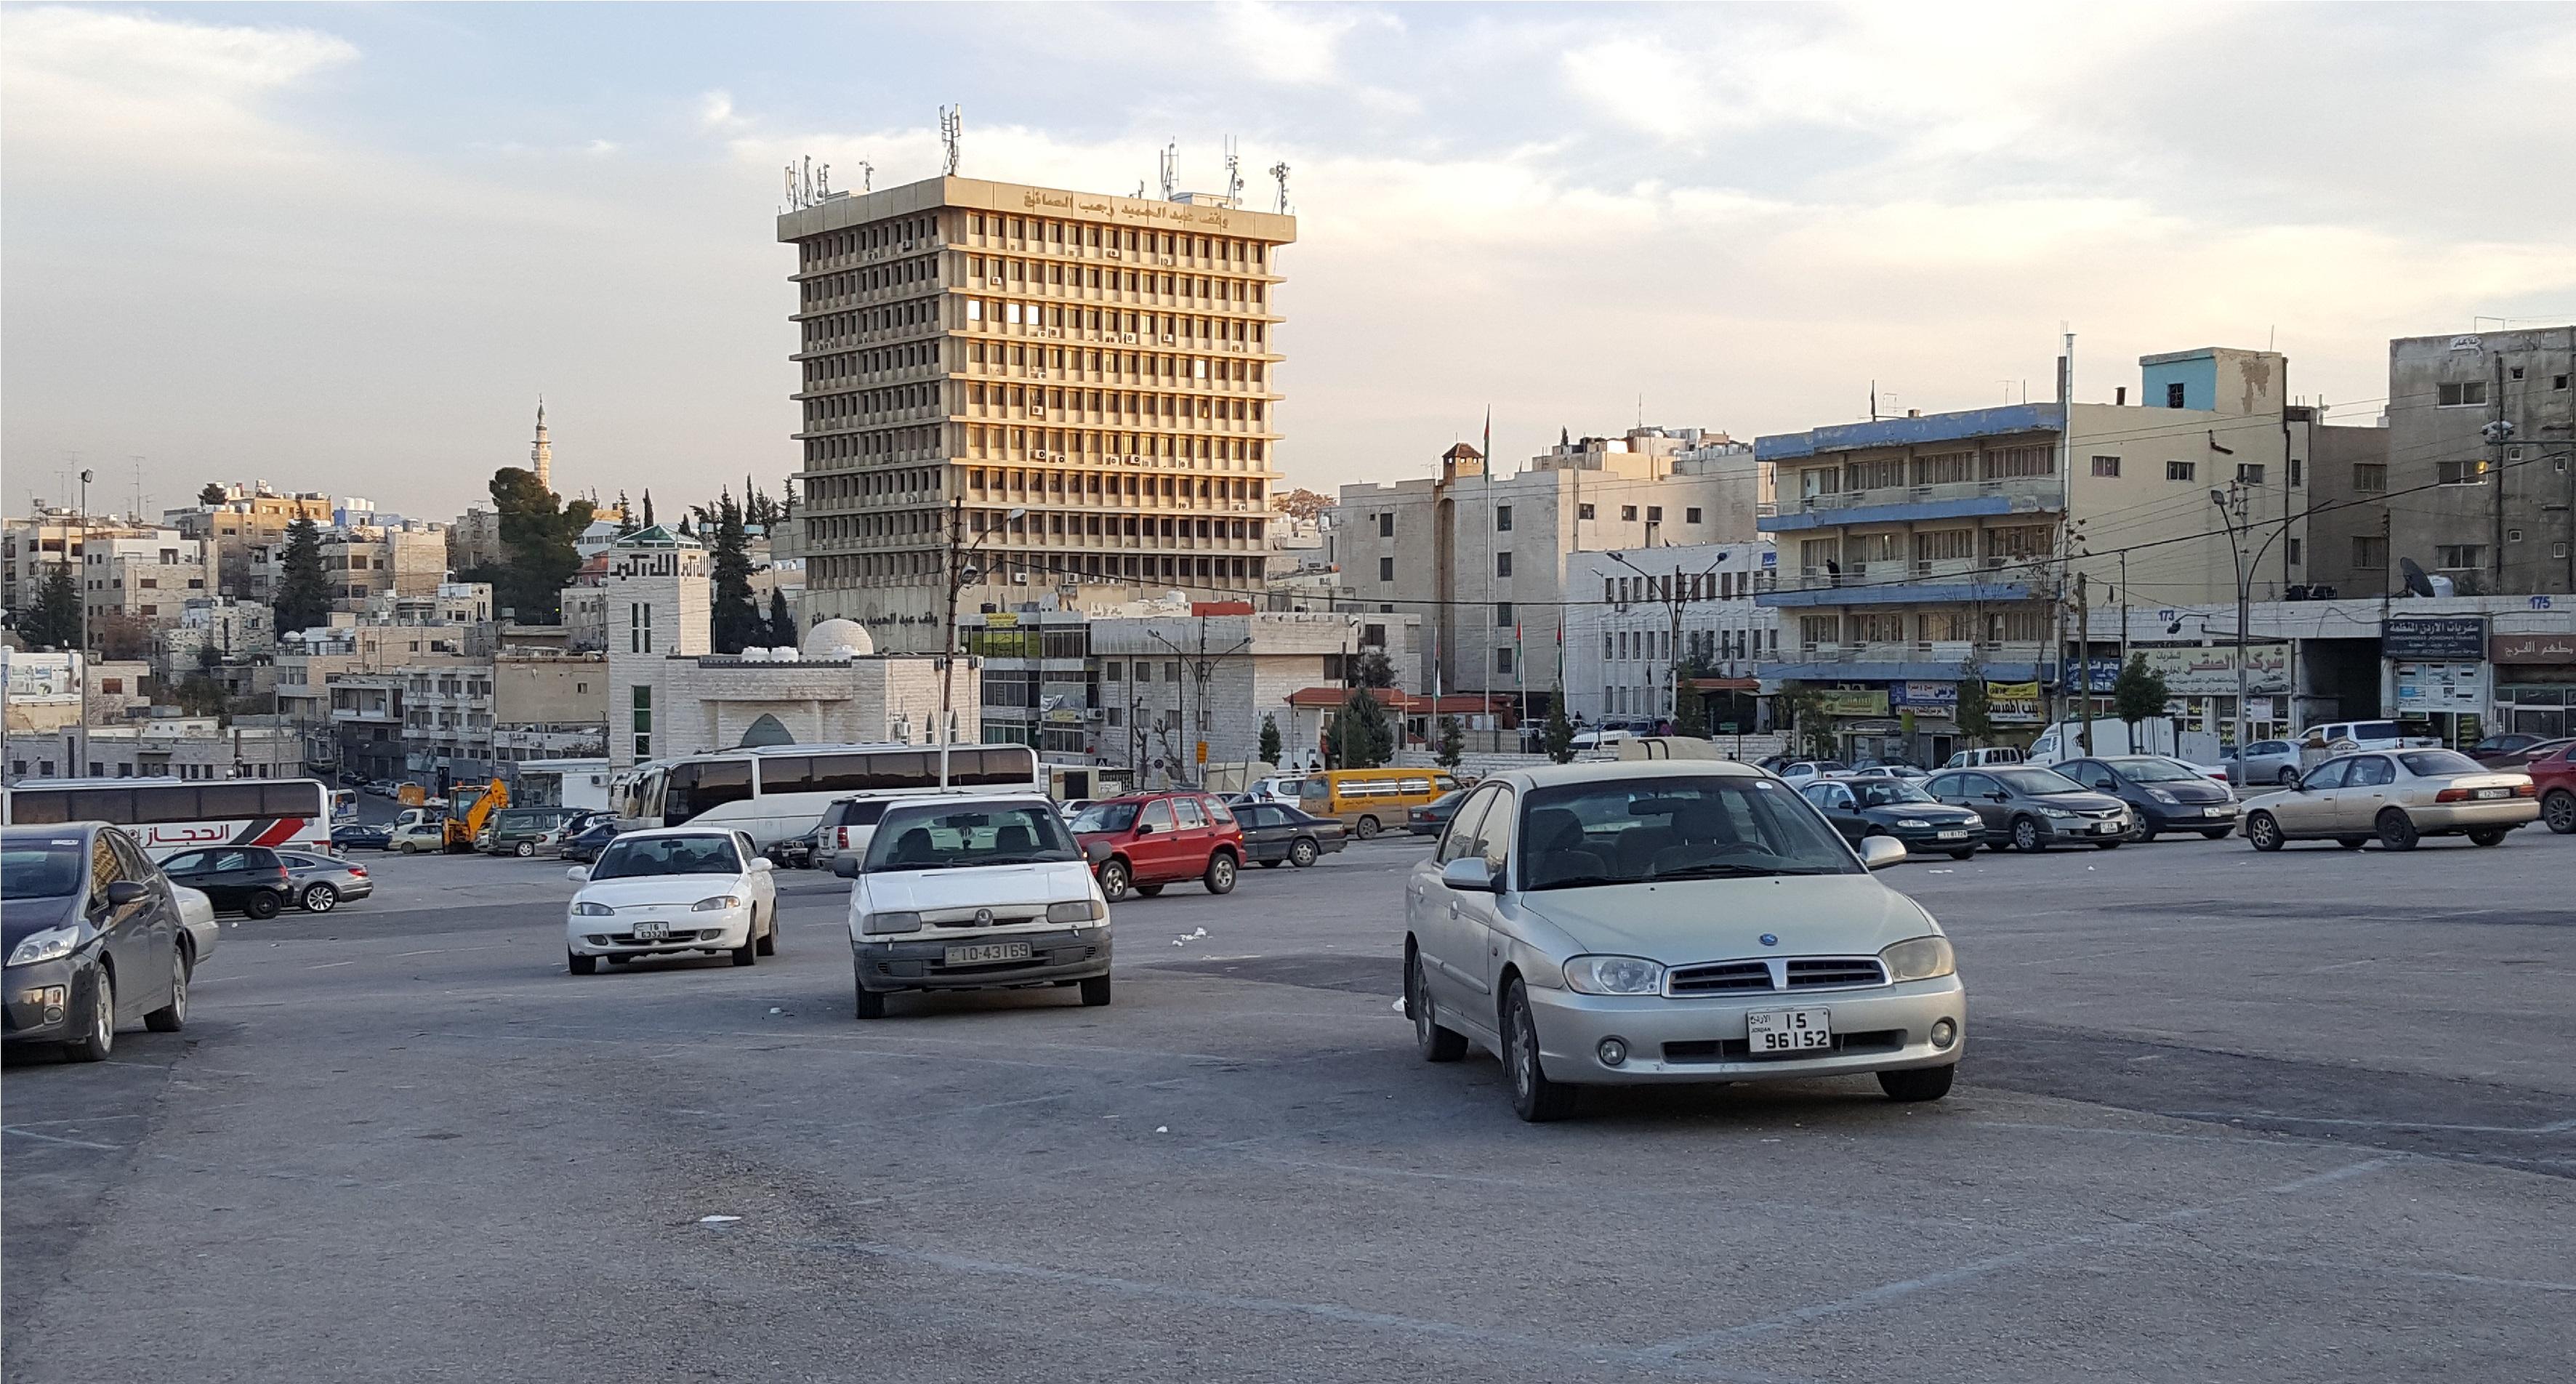 Abdali International Station